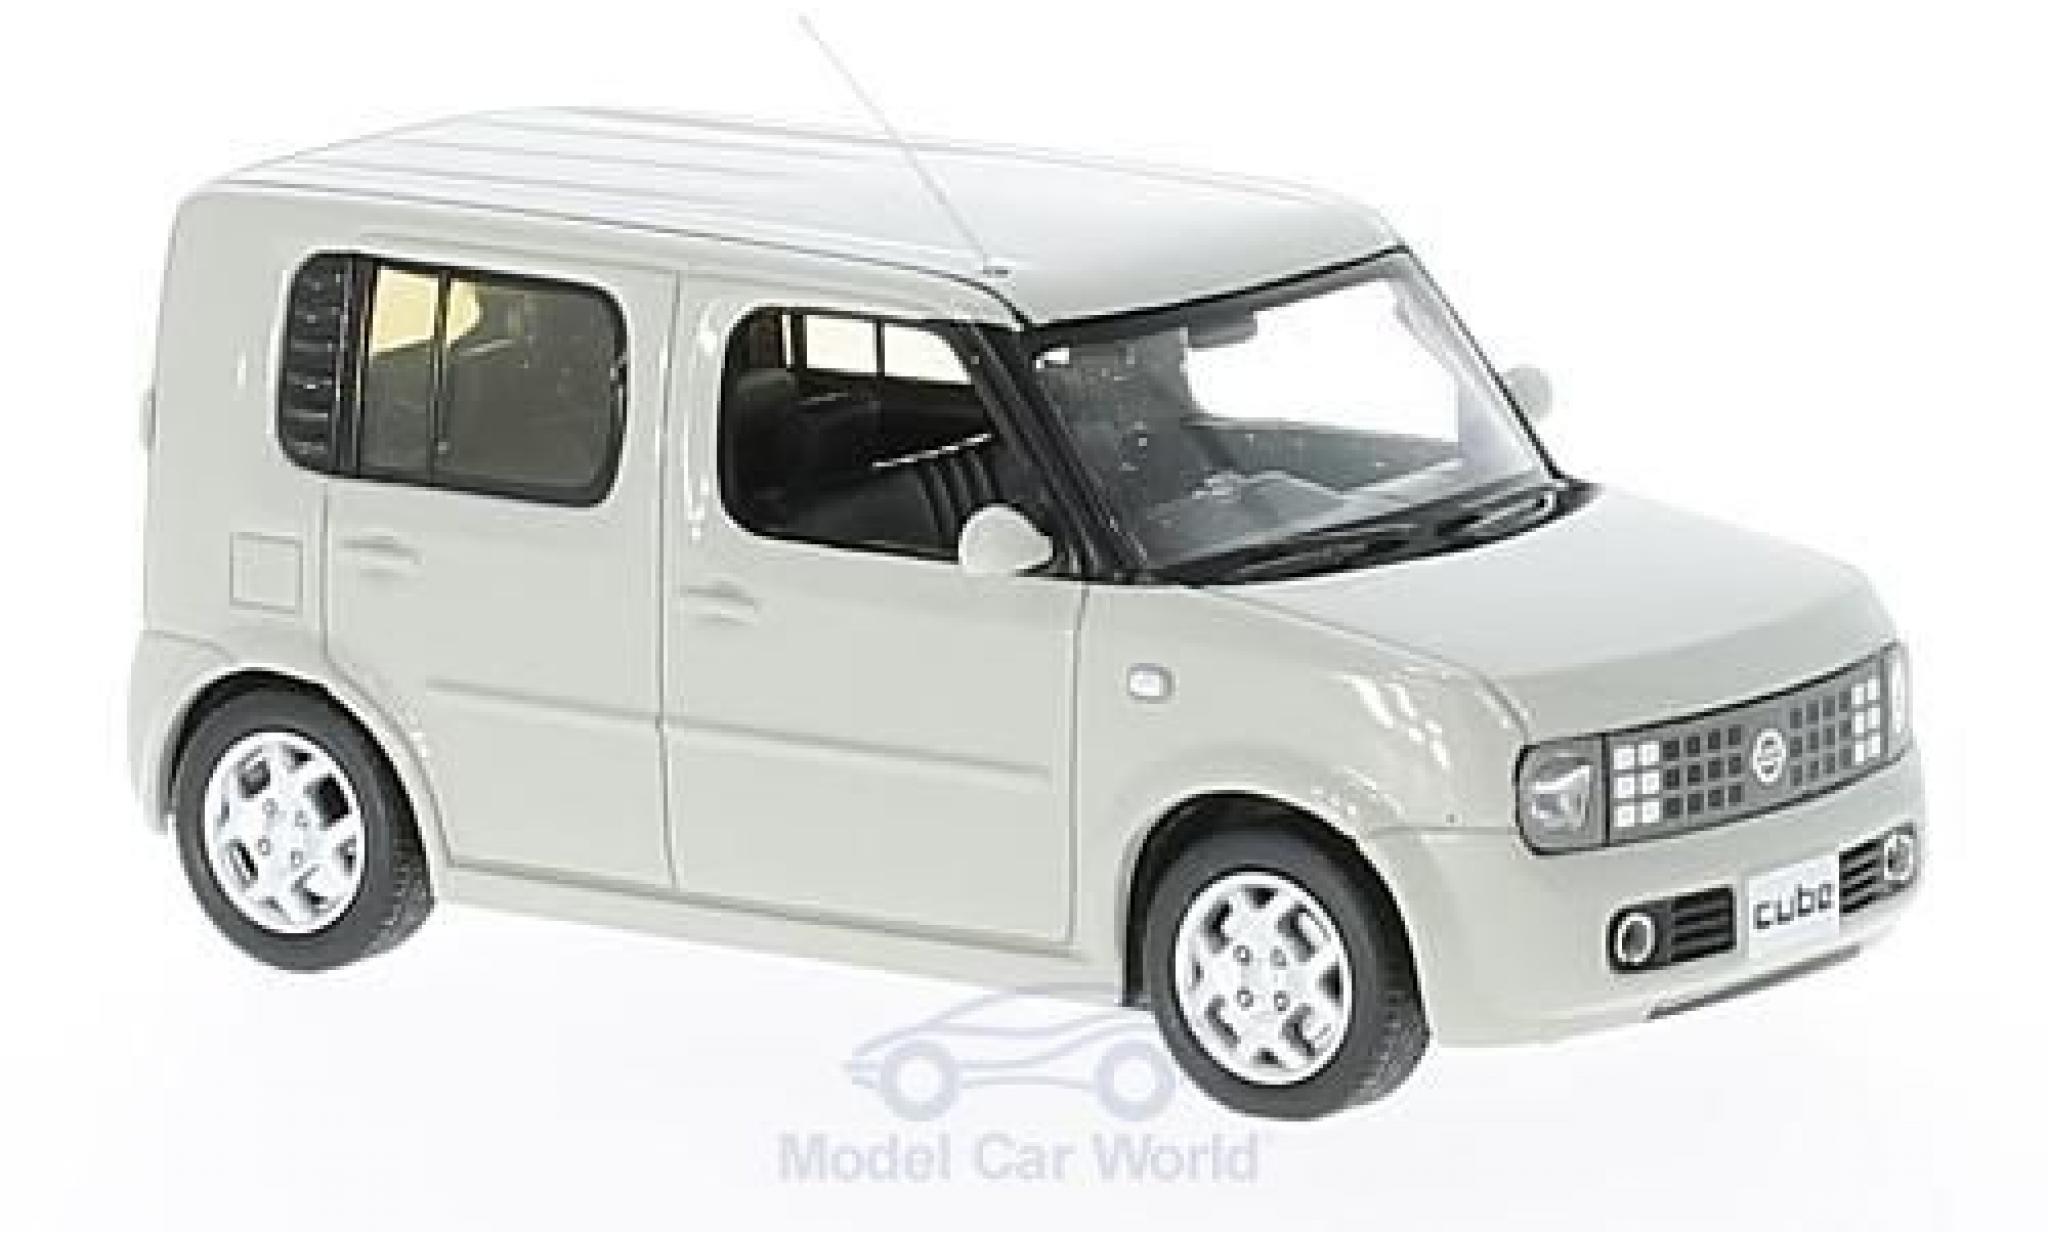 Nissan Cube 1/43 First 43 Models grise RHD 2003